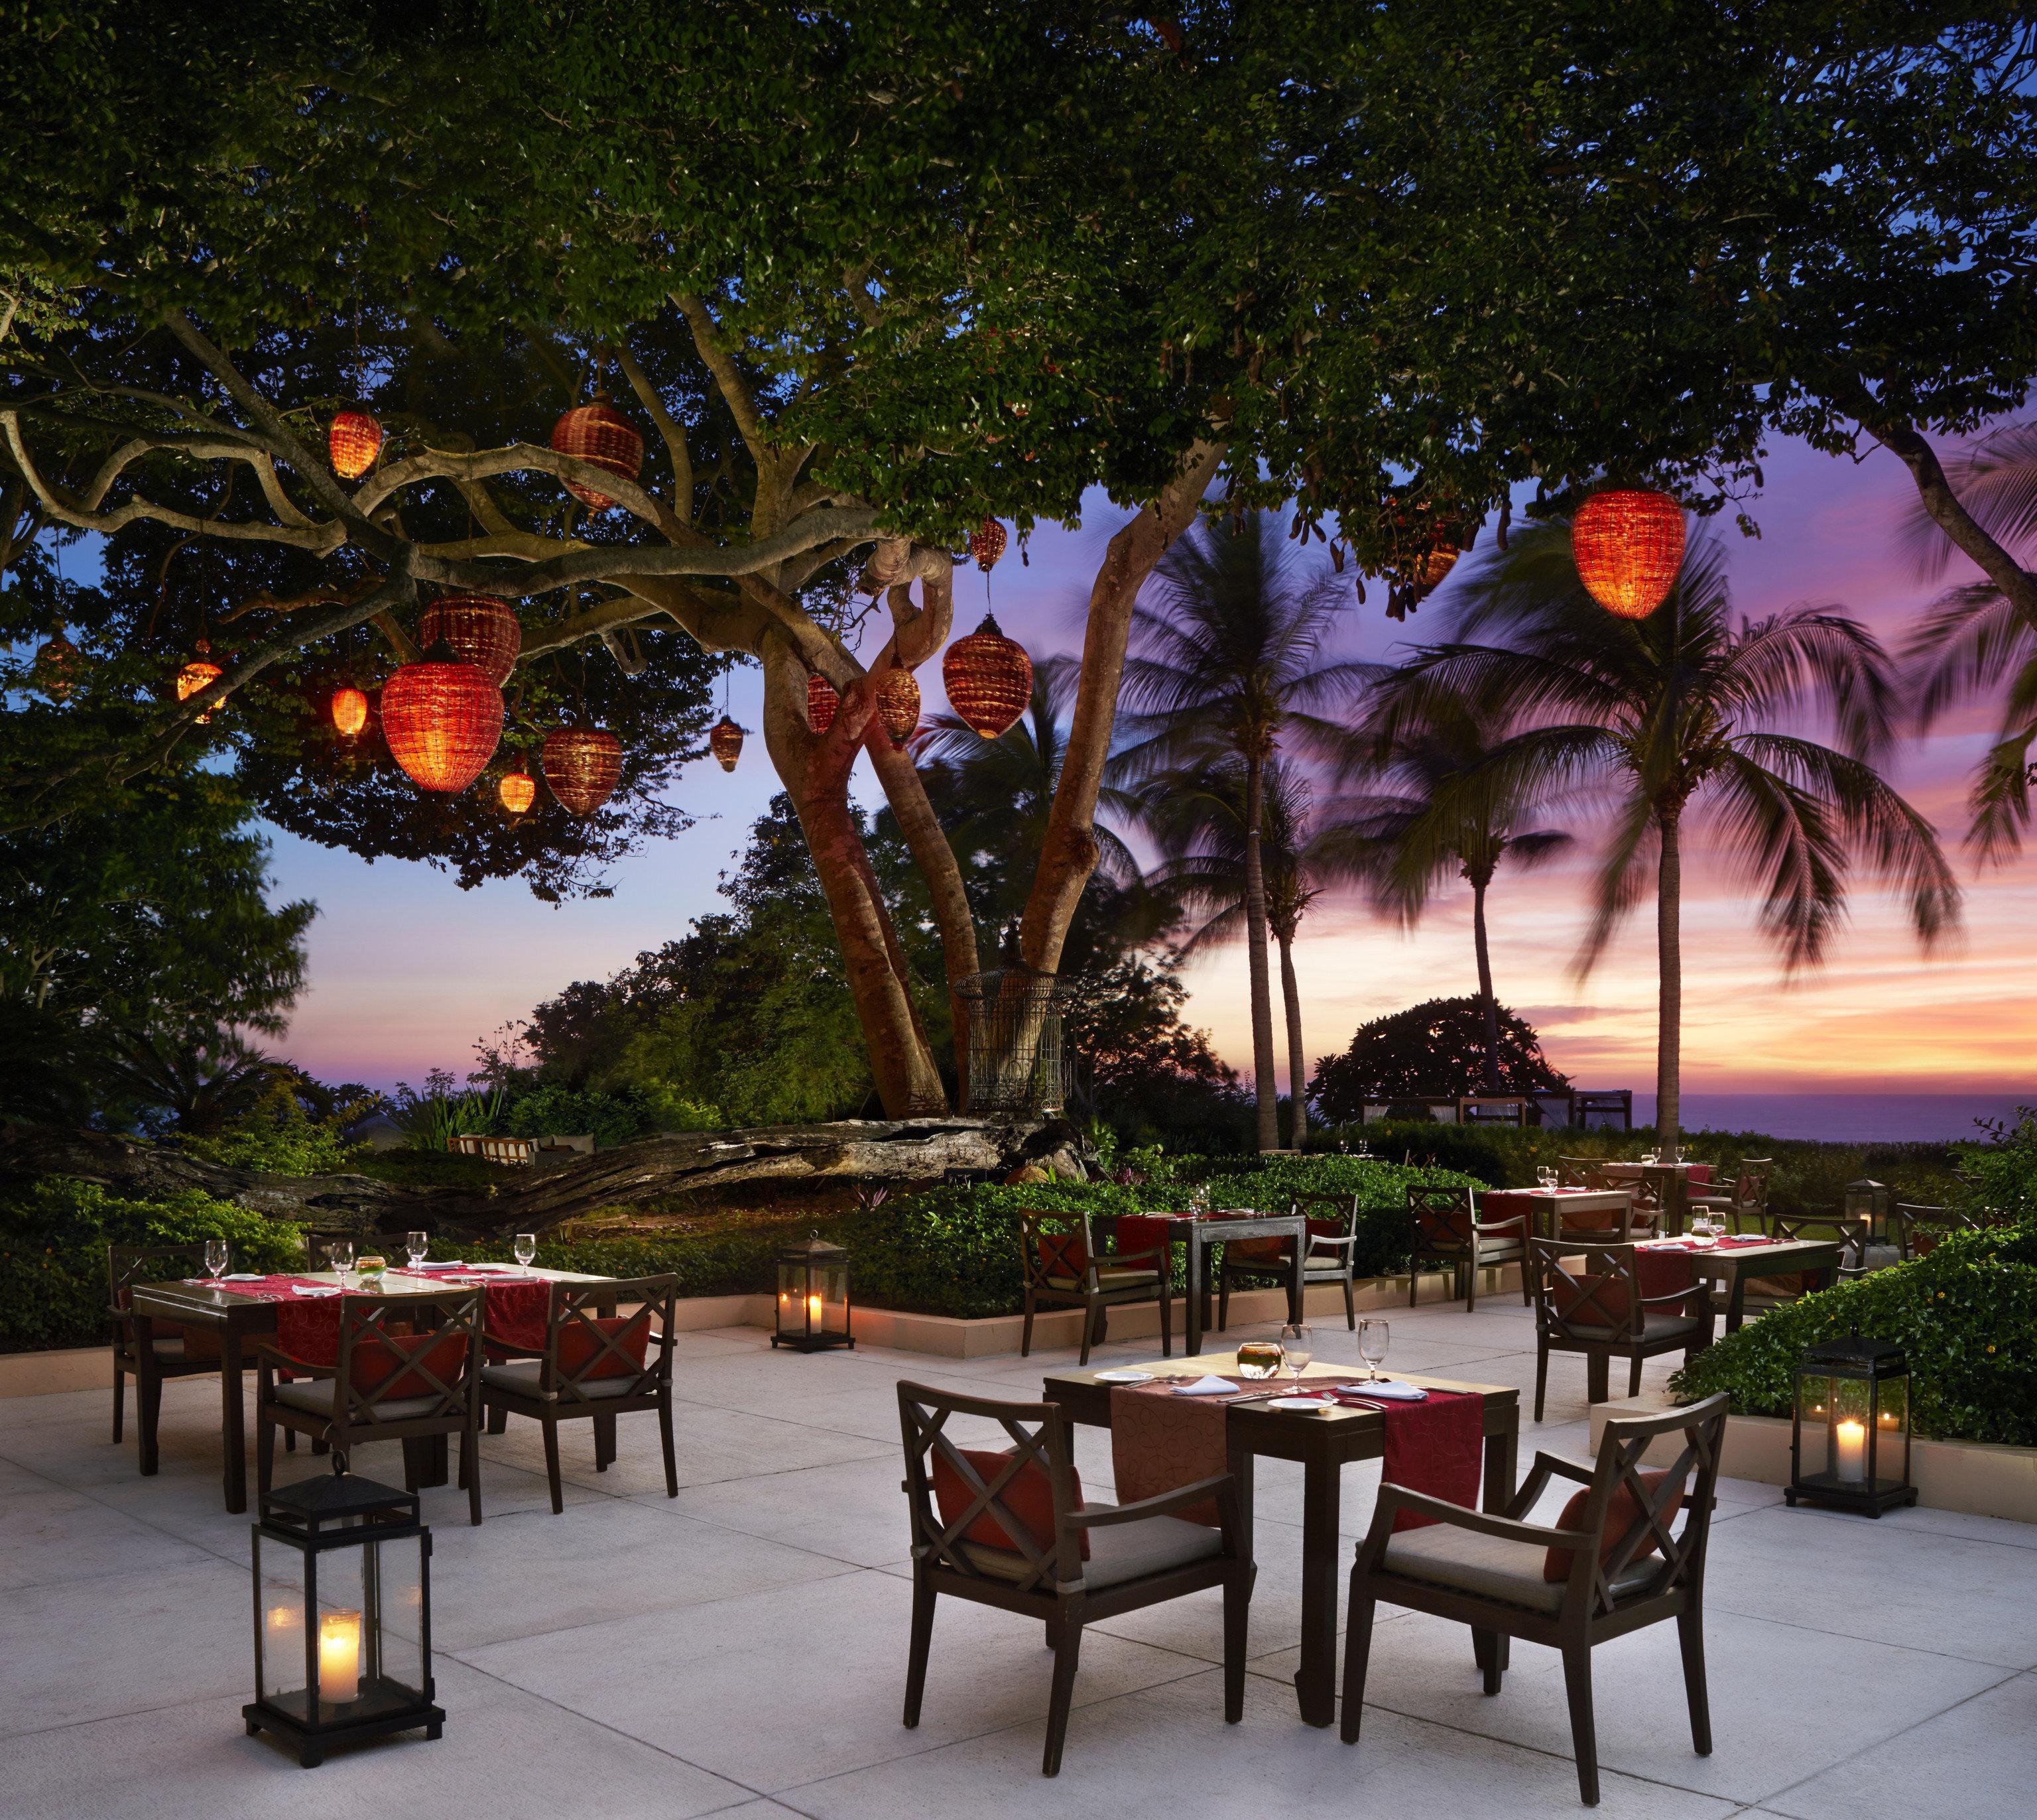 tree Resort restaurant lighting evening flower